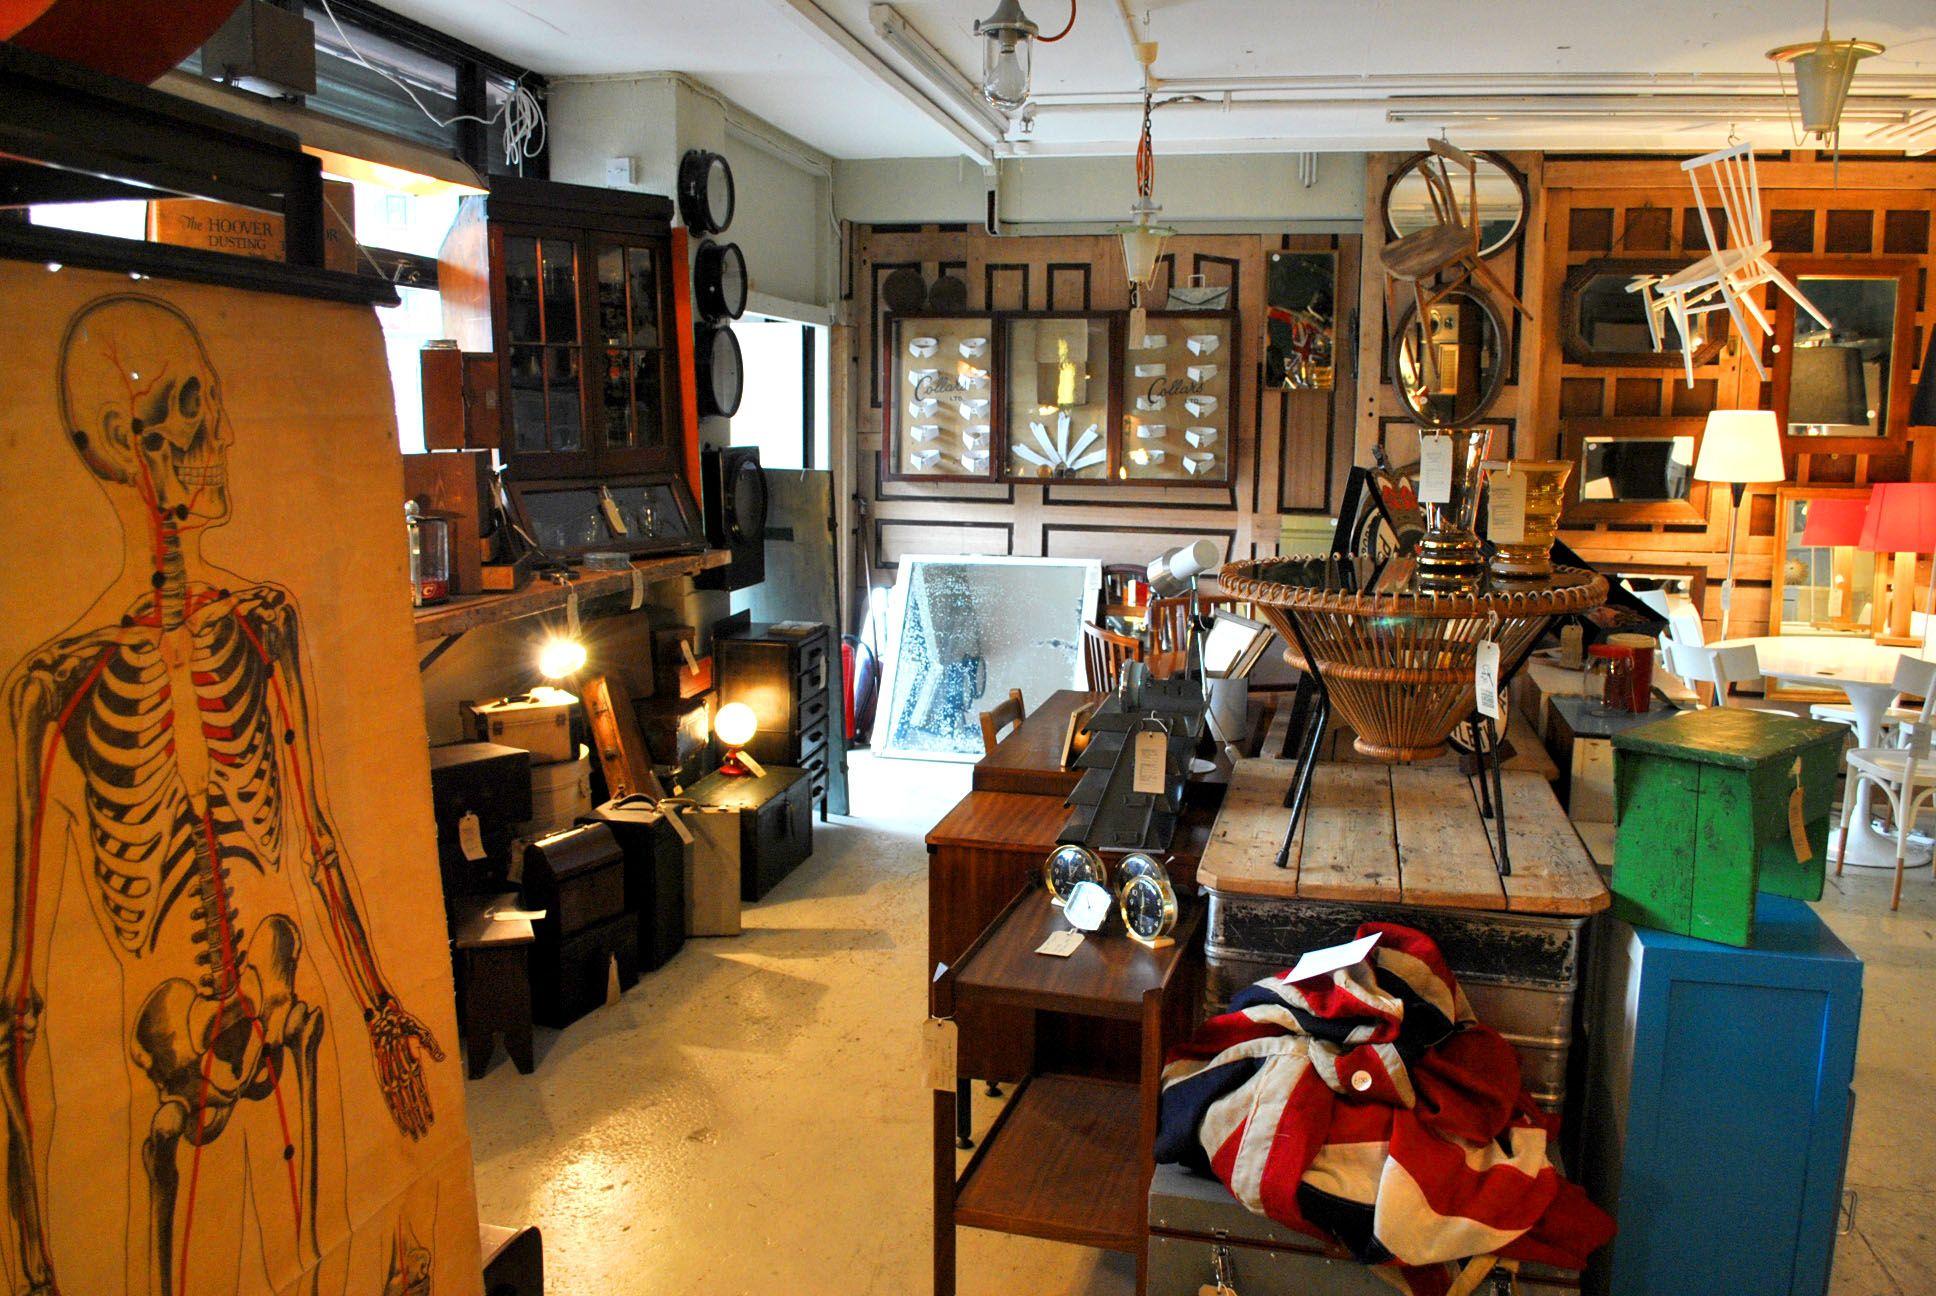 The Dog & Wardrobe Antique, Vintage and Retro Furniture